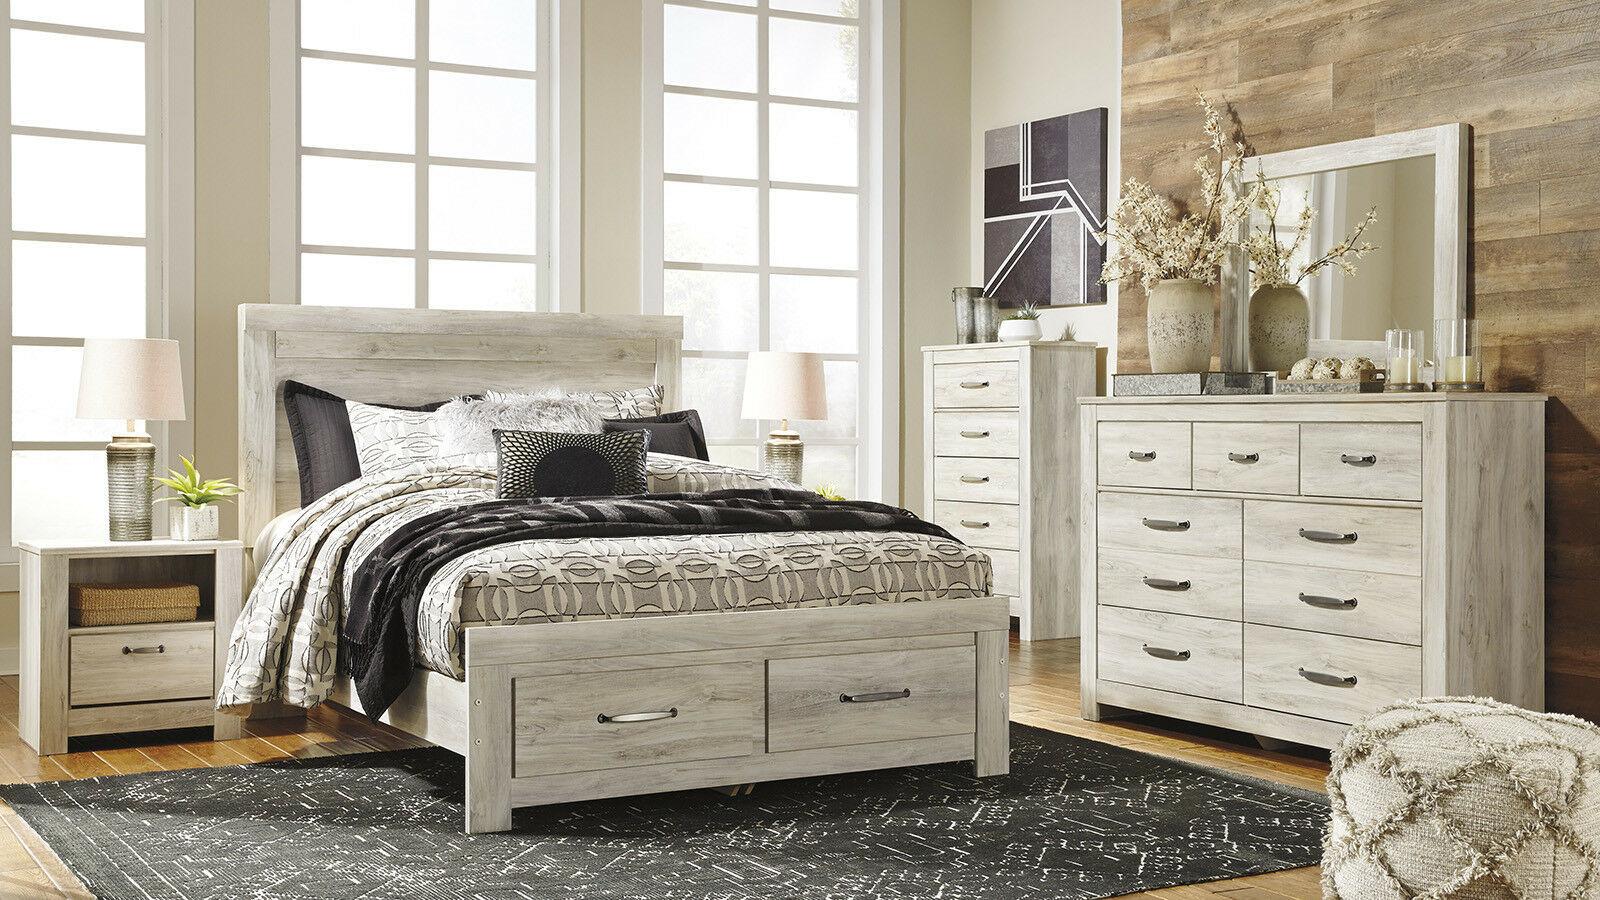 New modern off white furniture morwin 5pcs queen - White queen platform bedroom set ...